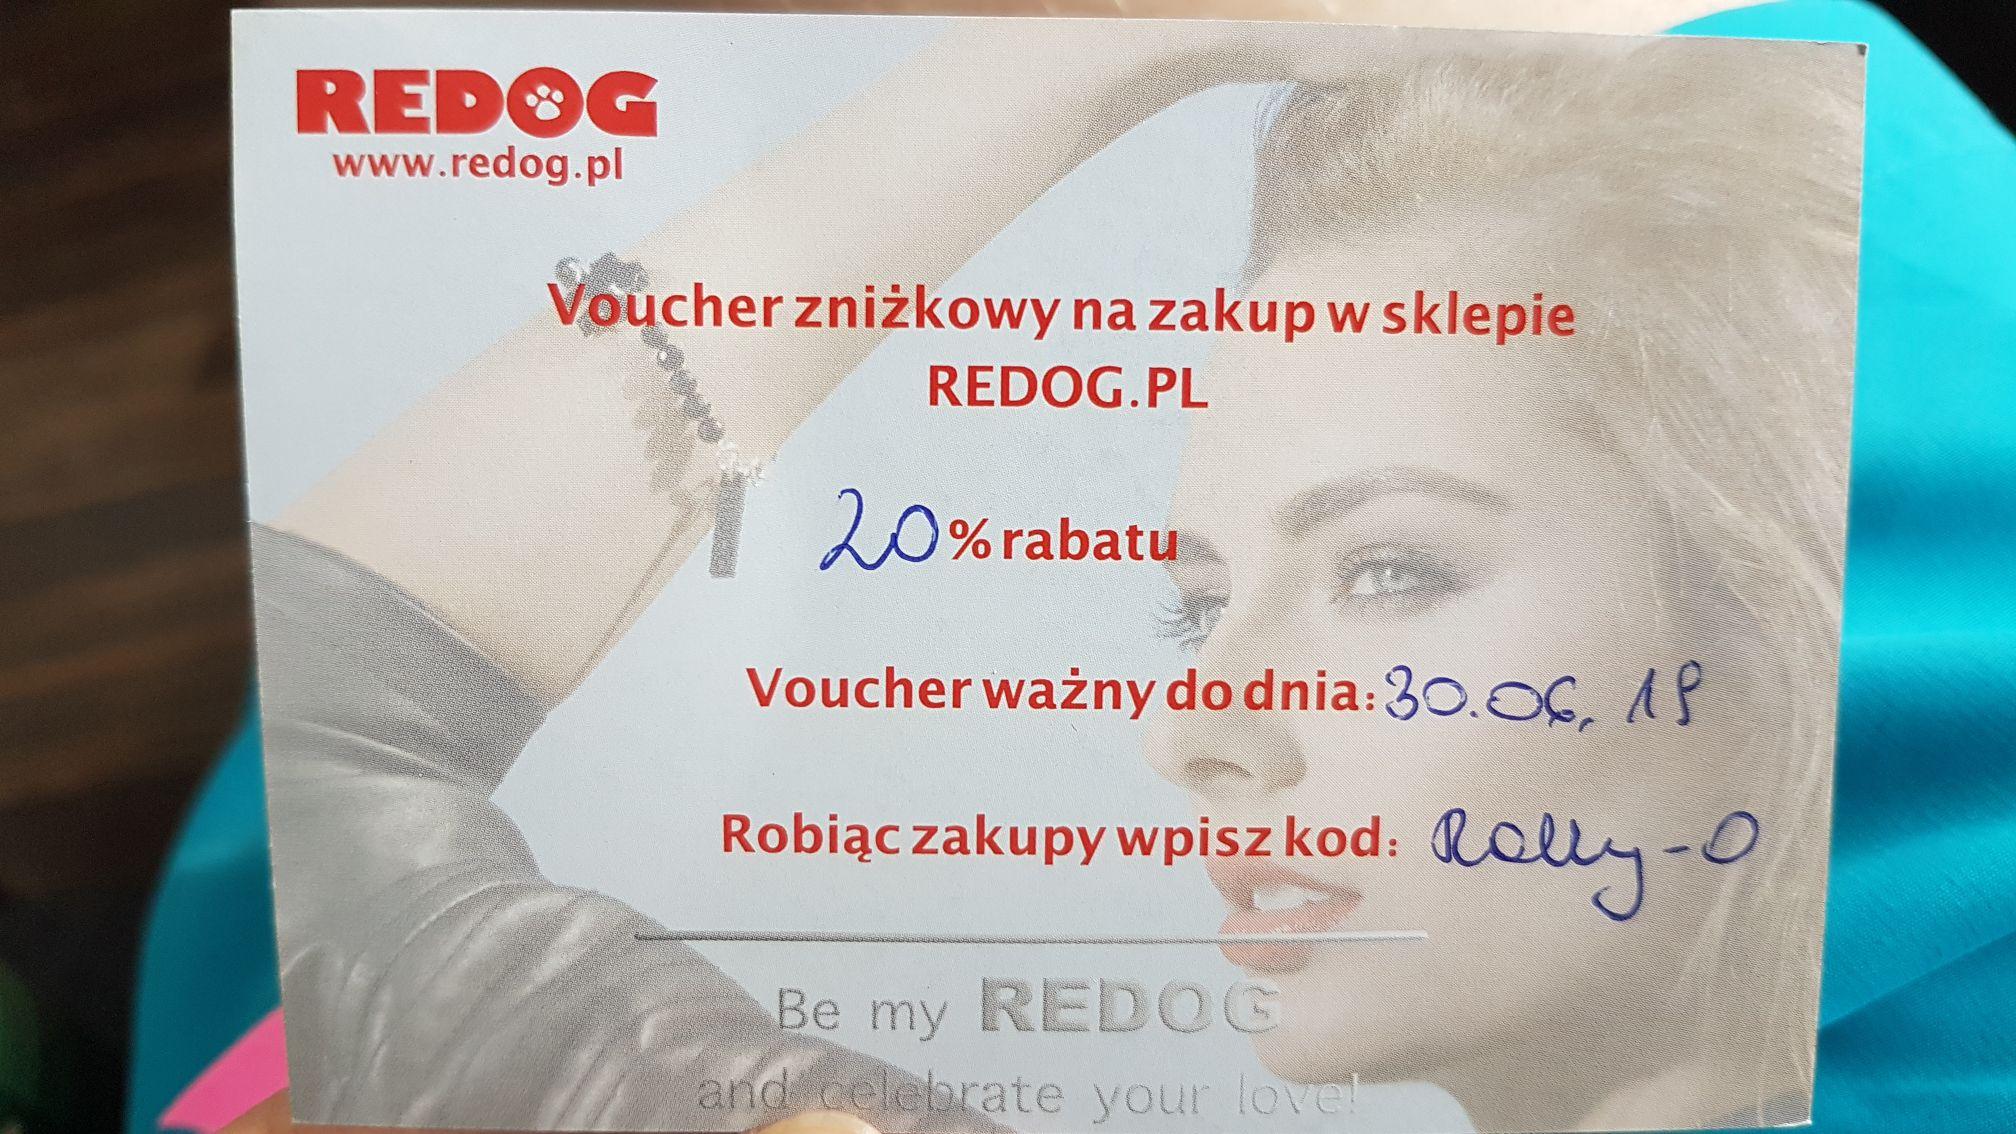 Rabat 20% na redog.pl